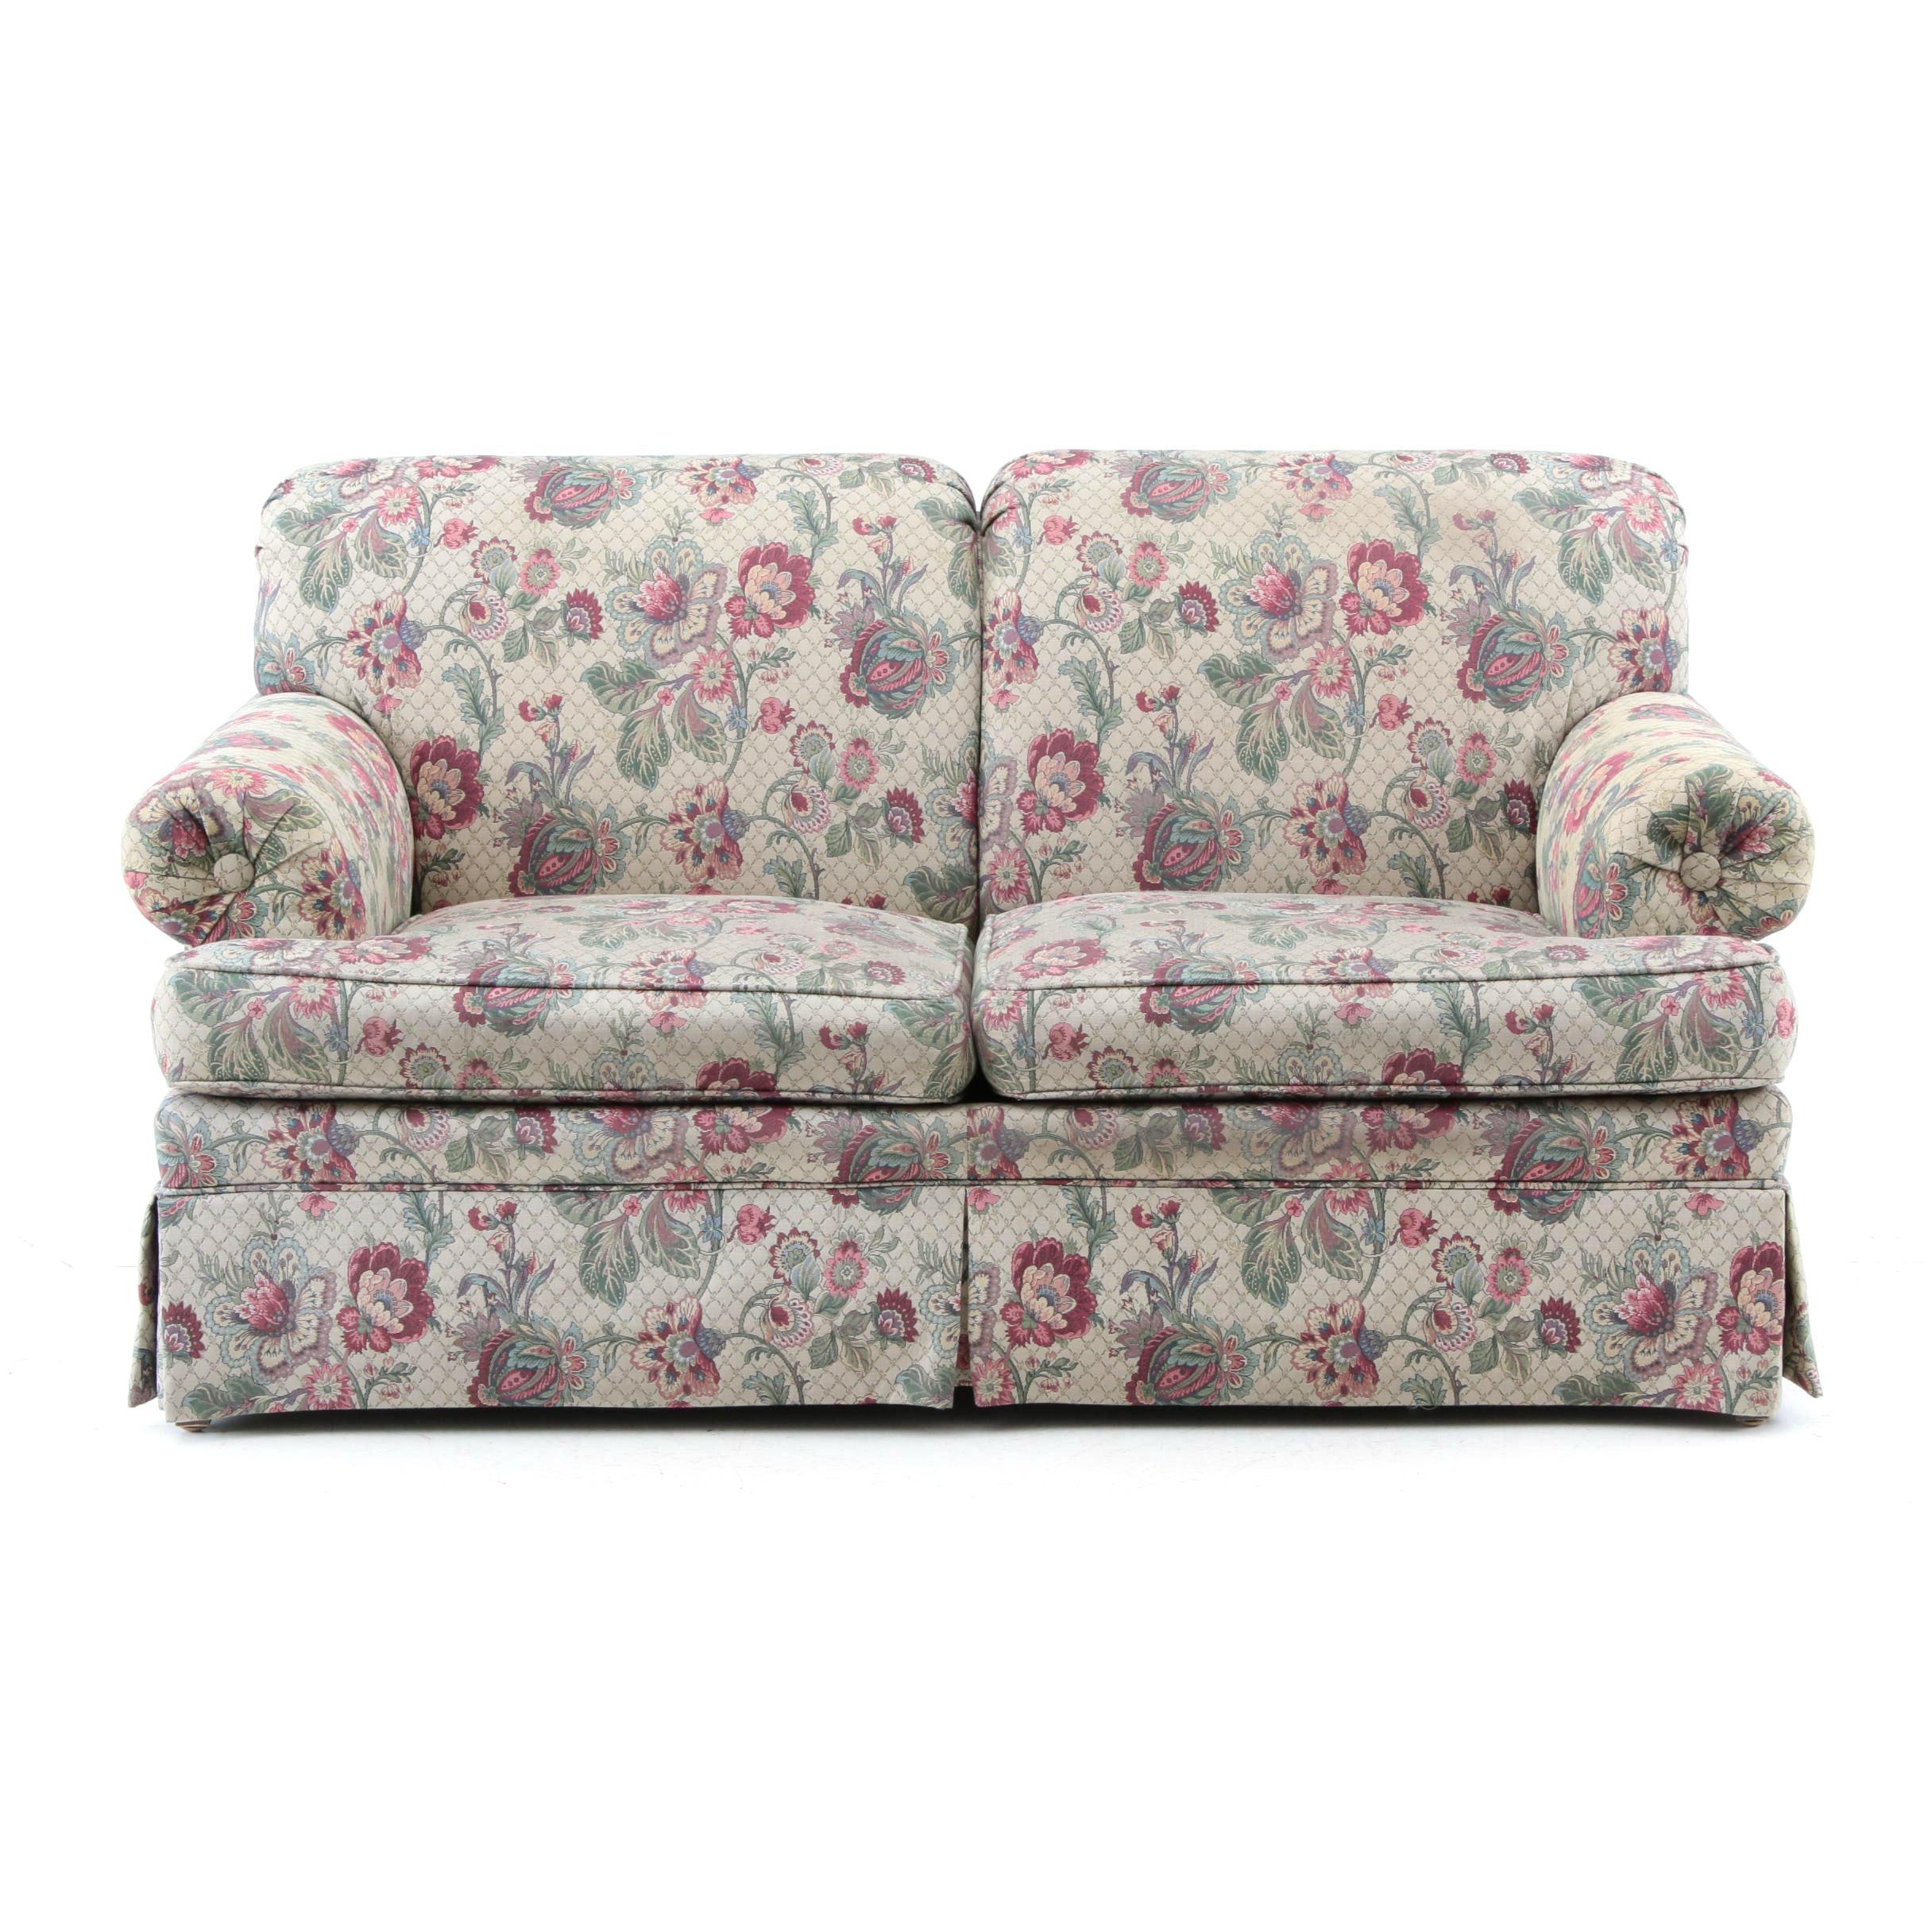 Ethan Allen Floral Upholstered Love Seat ...